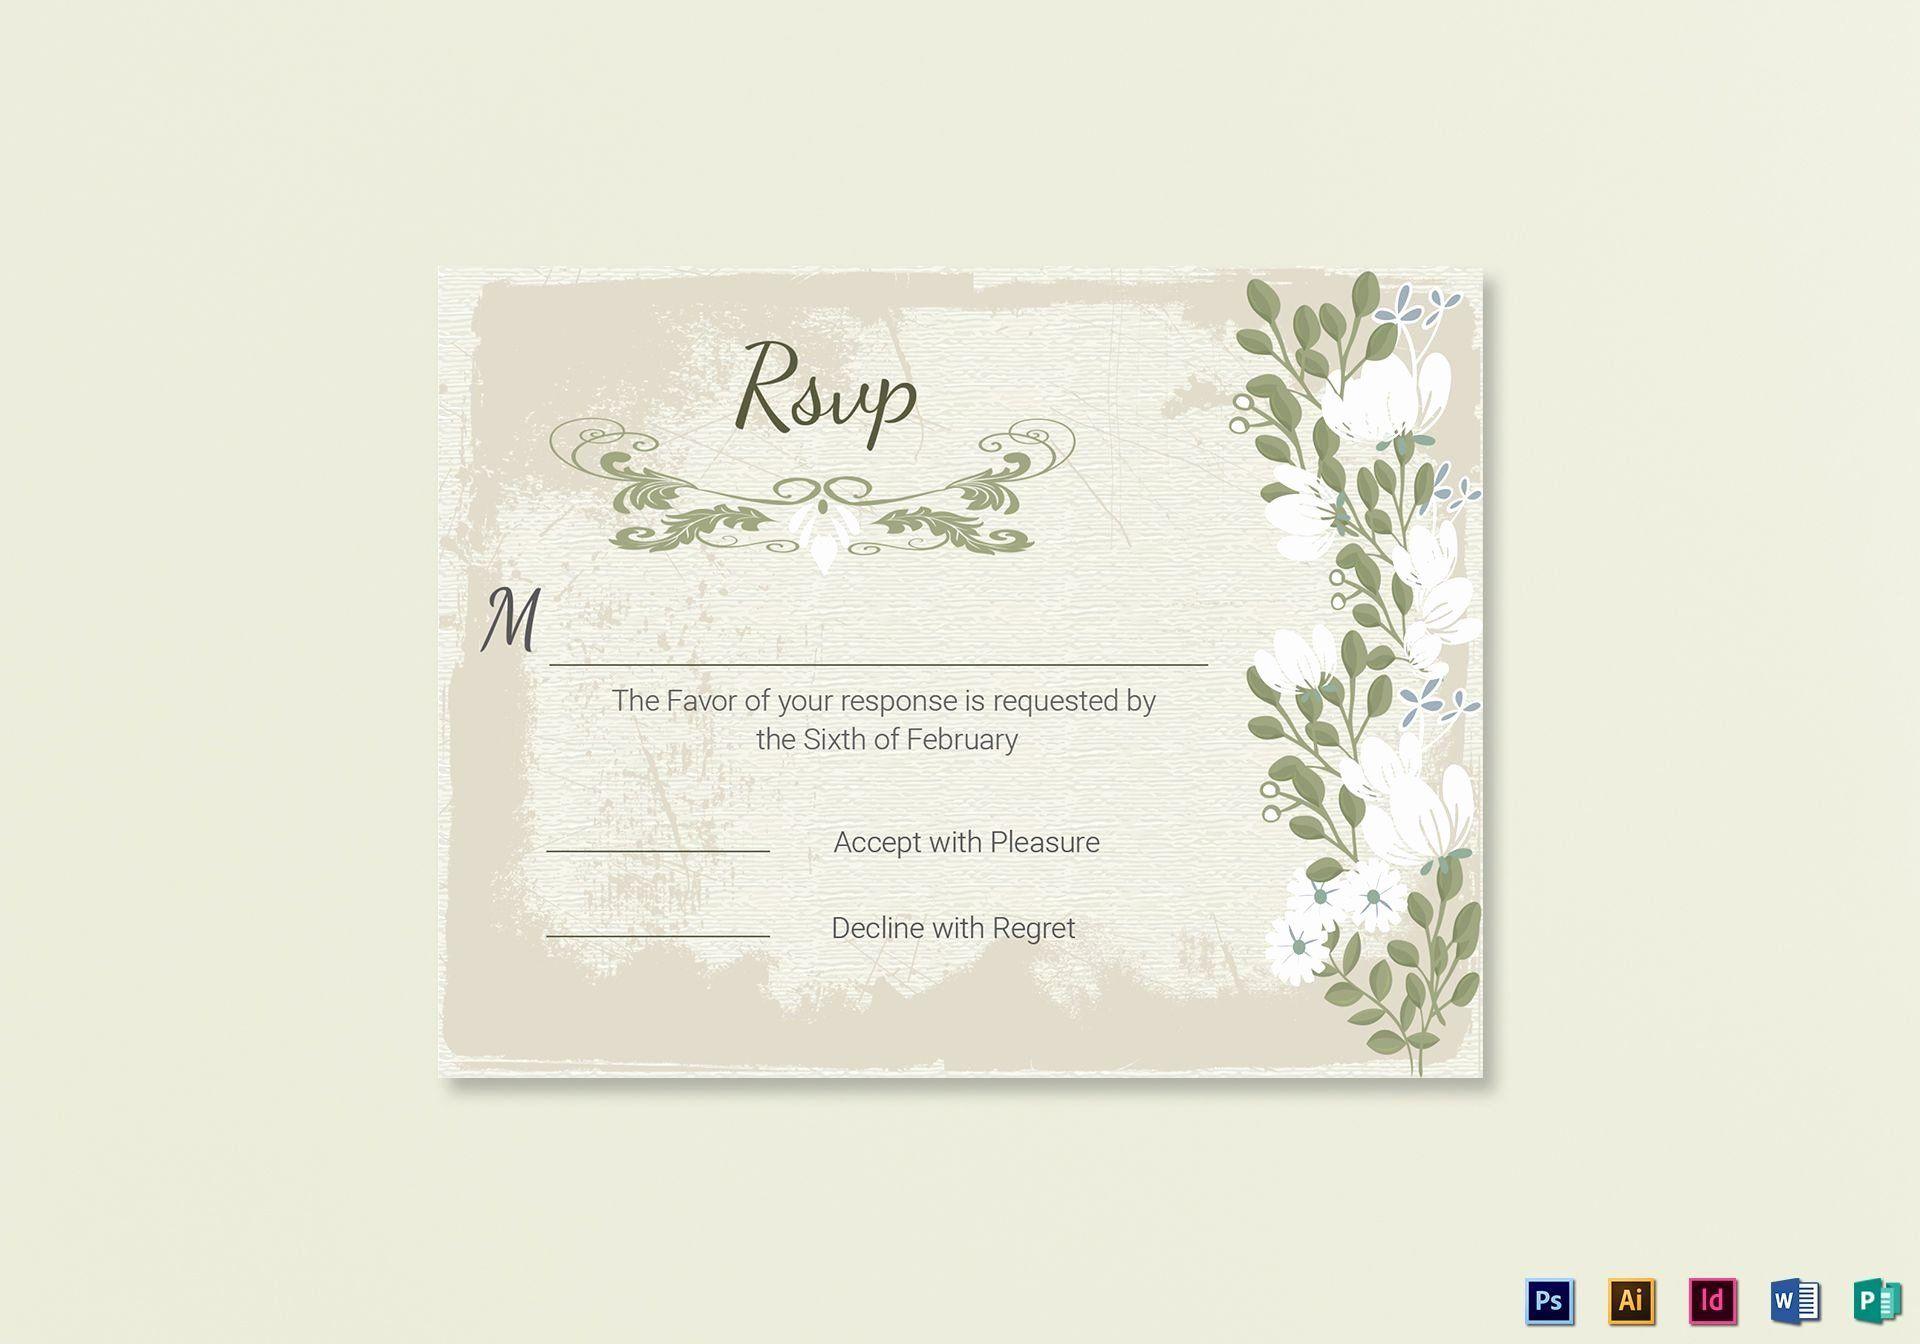 Wedding Response Card Templates Lovely 013 Wedding Rsvp Cards Templates Template Shocking Ide Rsvp Wedding Cards Wedding Response Cards Free Wedding Printables